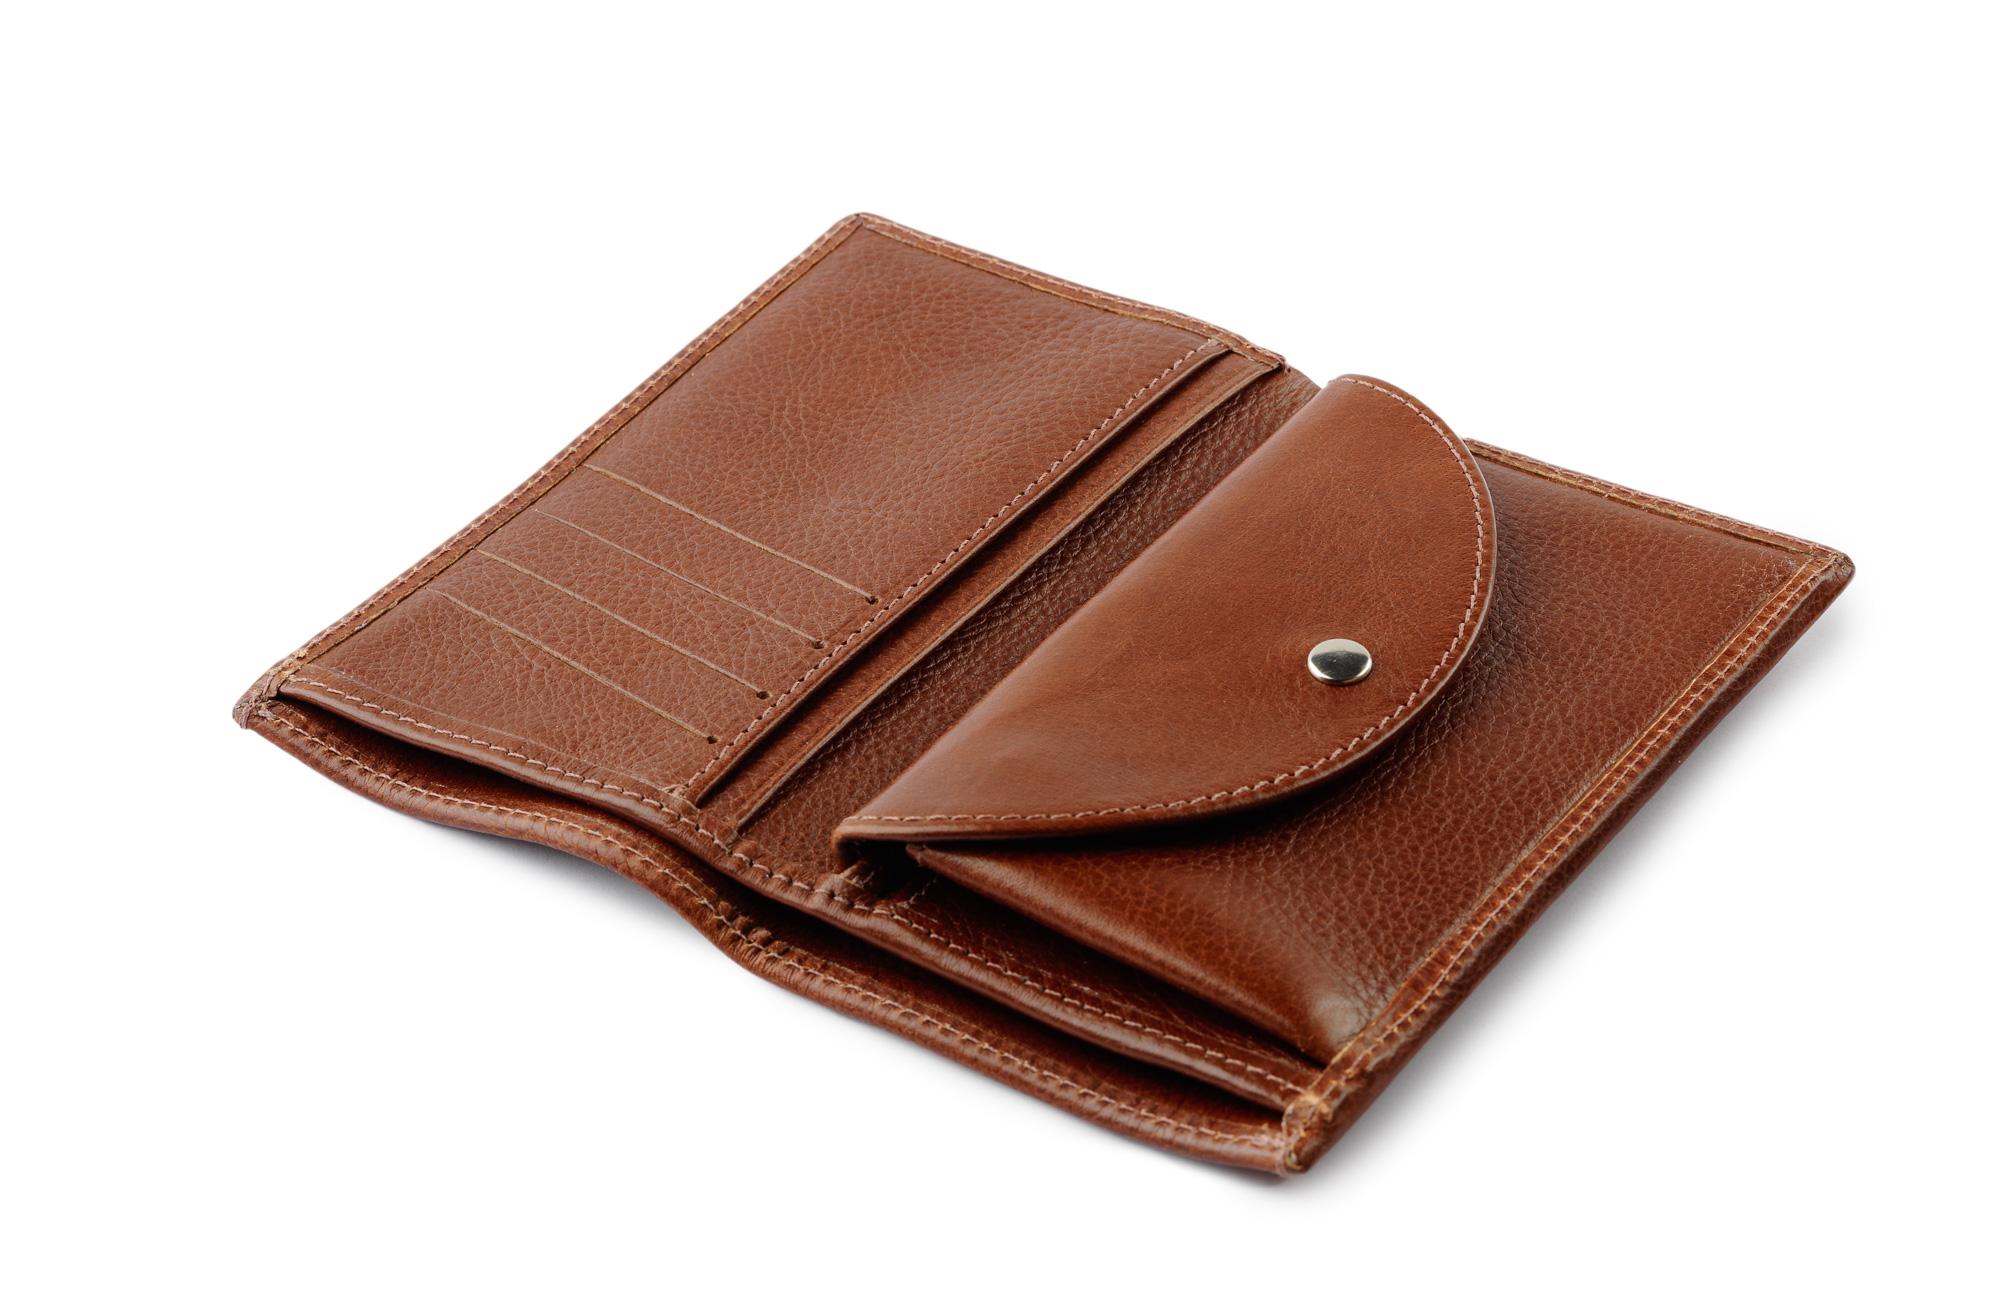 Holden Ladies Medium Leather Wallet Chestnut Inside 2 Copy  QC.jpg